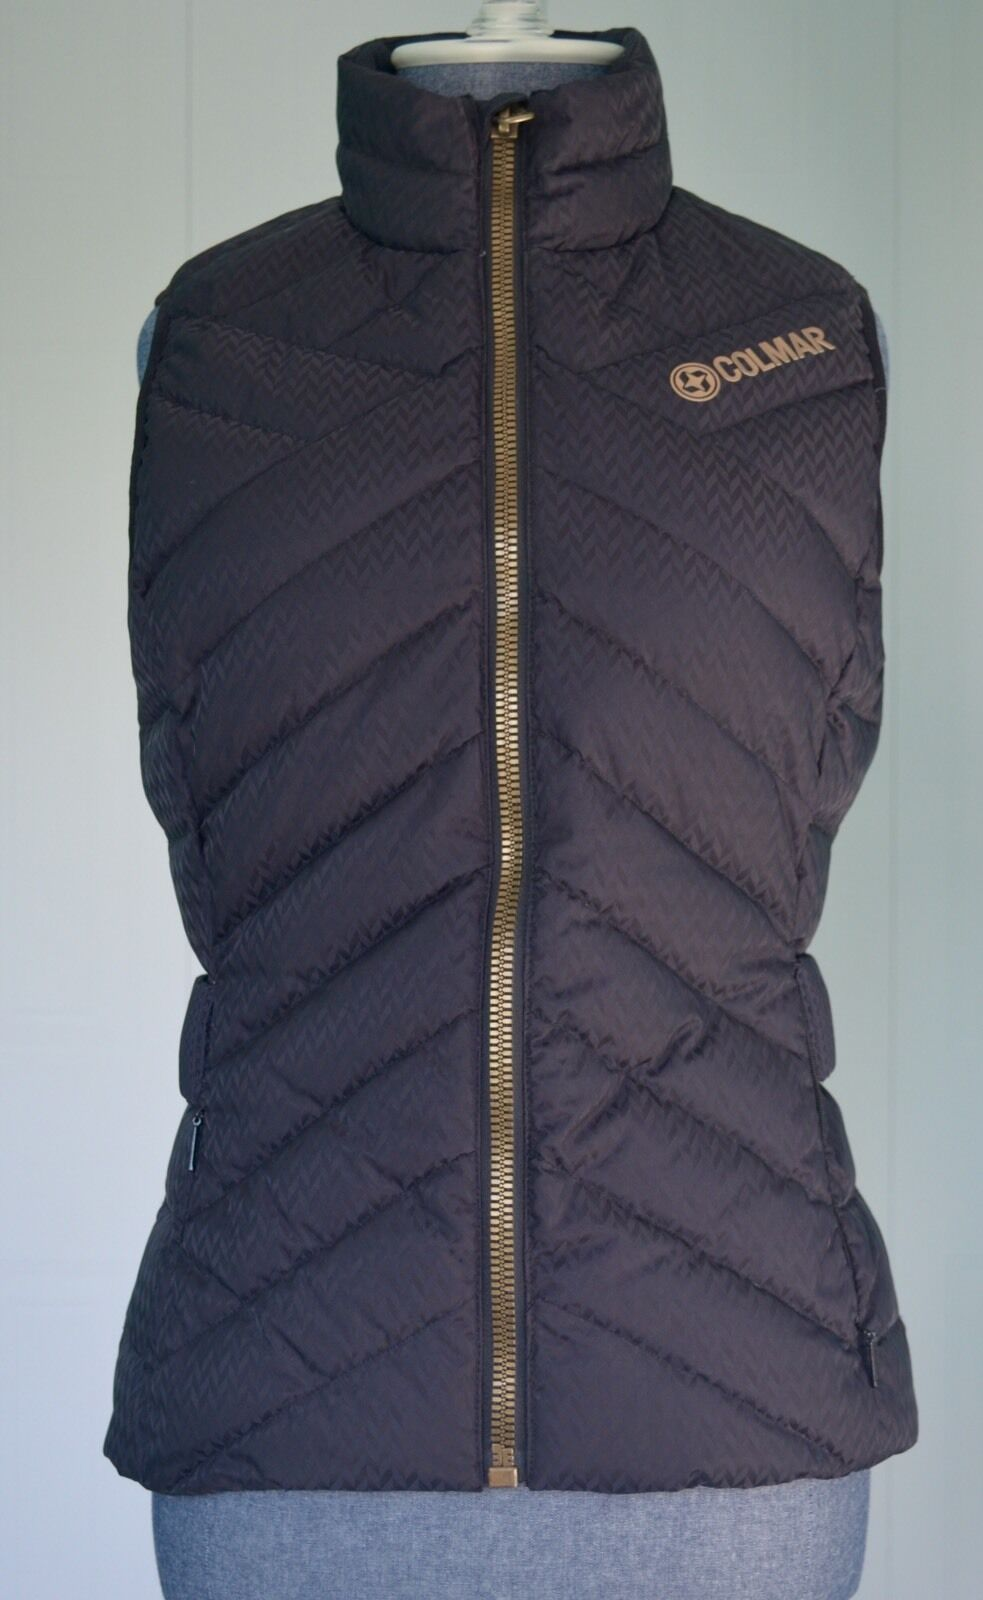 e331bdca0 Ski Down Chance Colmar Gilet NWT Vest 6 US 42 IT Size Women's Mid ...